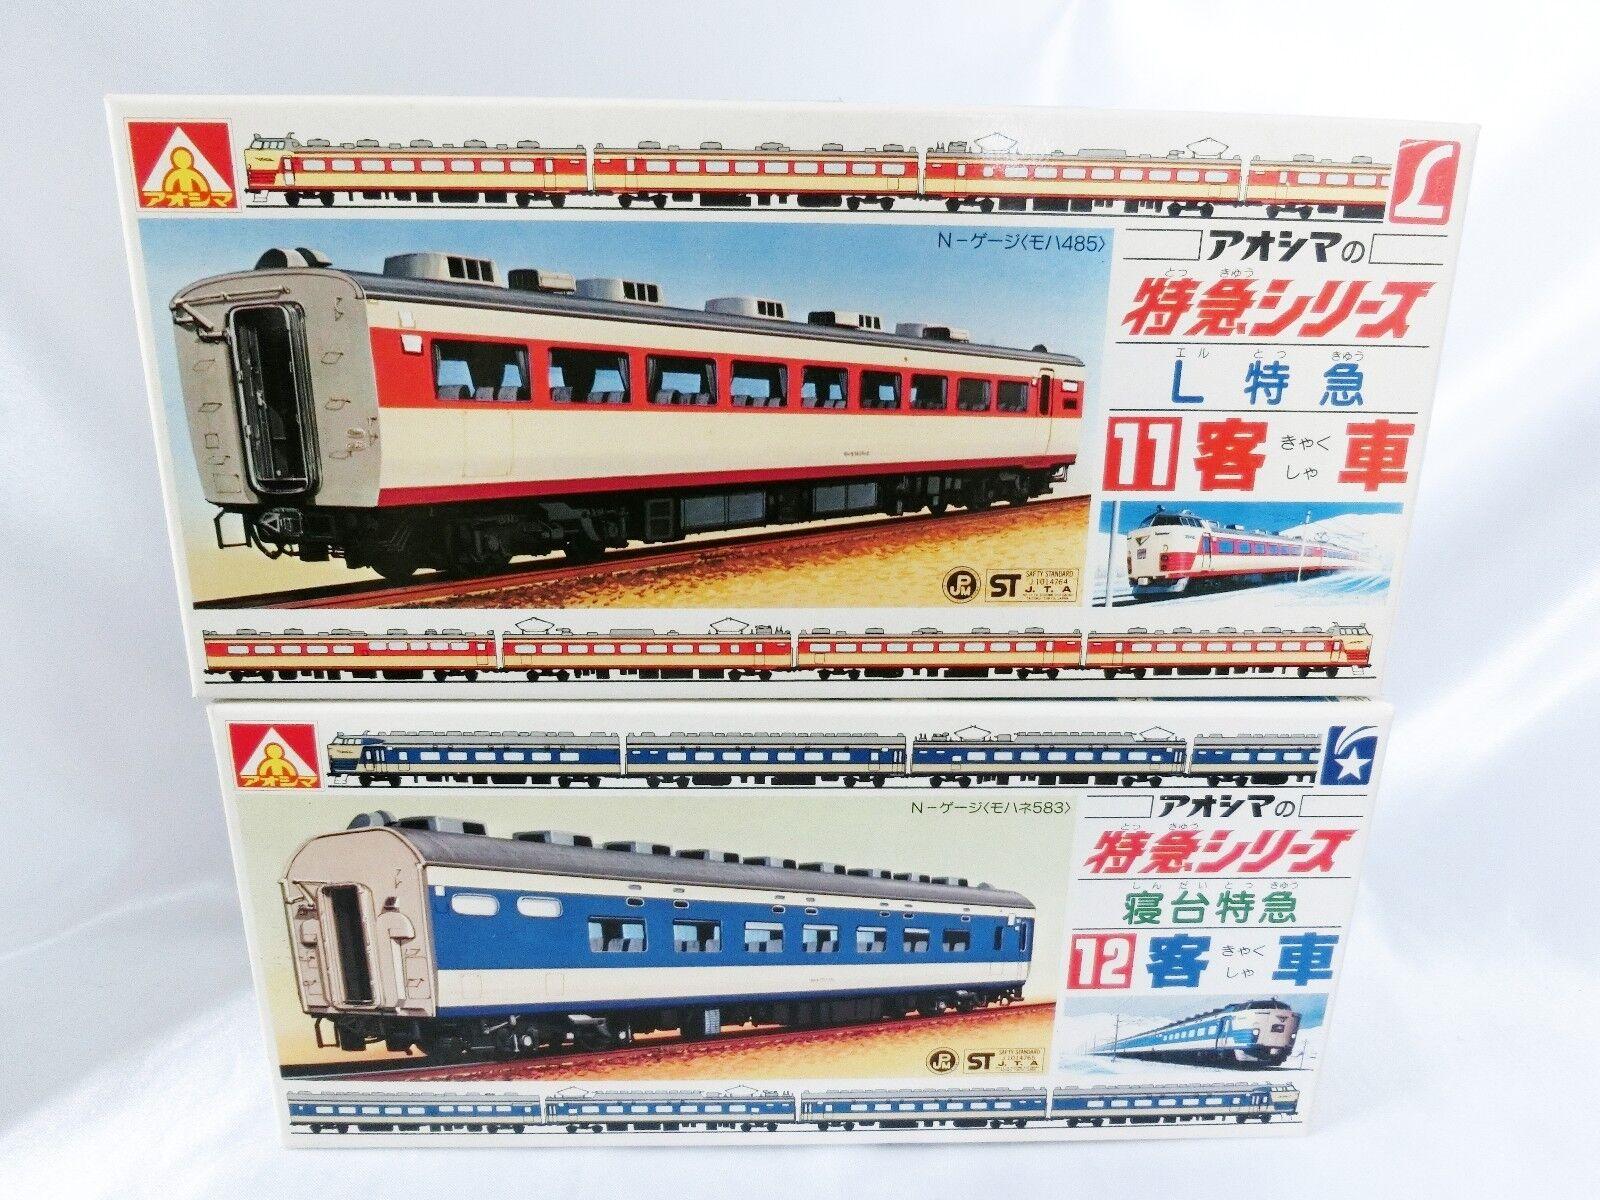 1/150 Aoshima of express series No.11 L express passenger 12 sleeping berths F/S